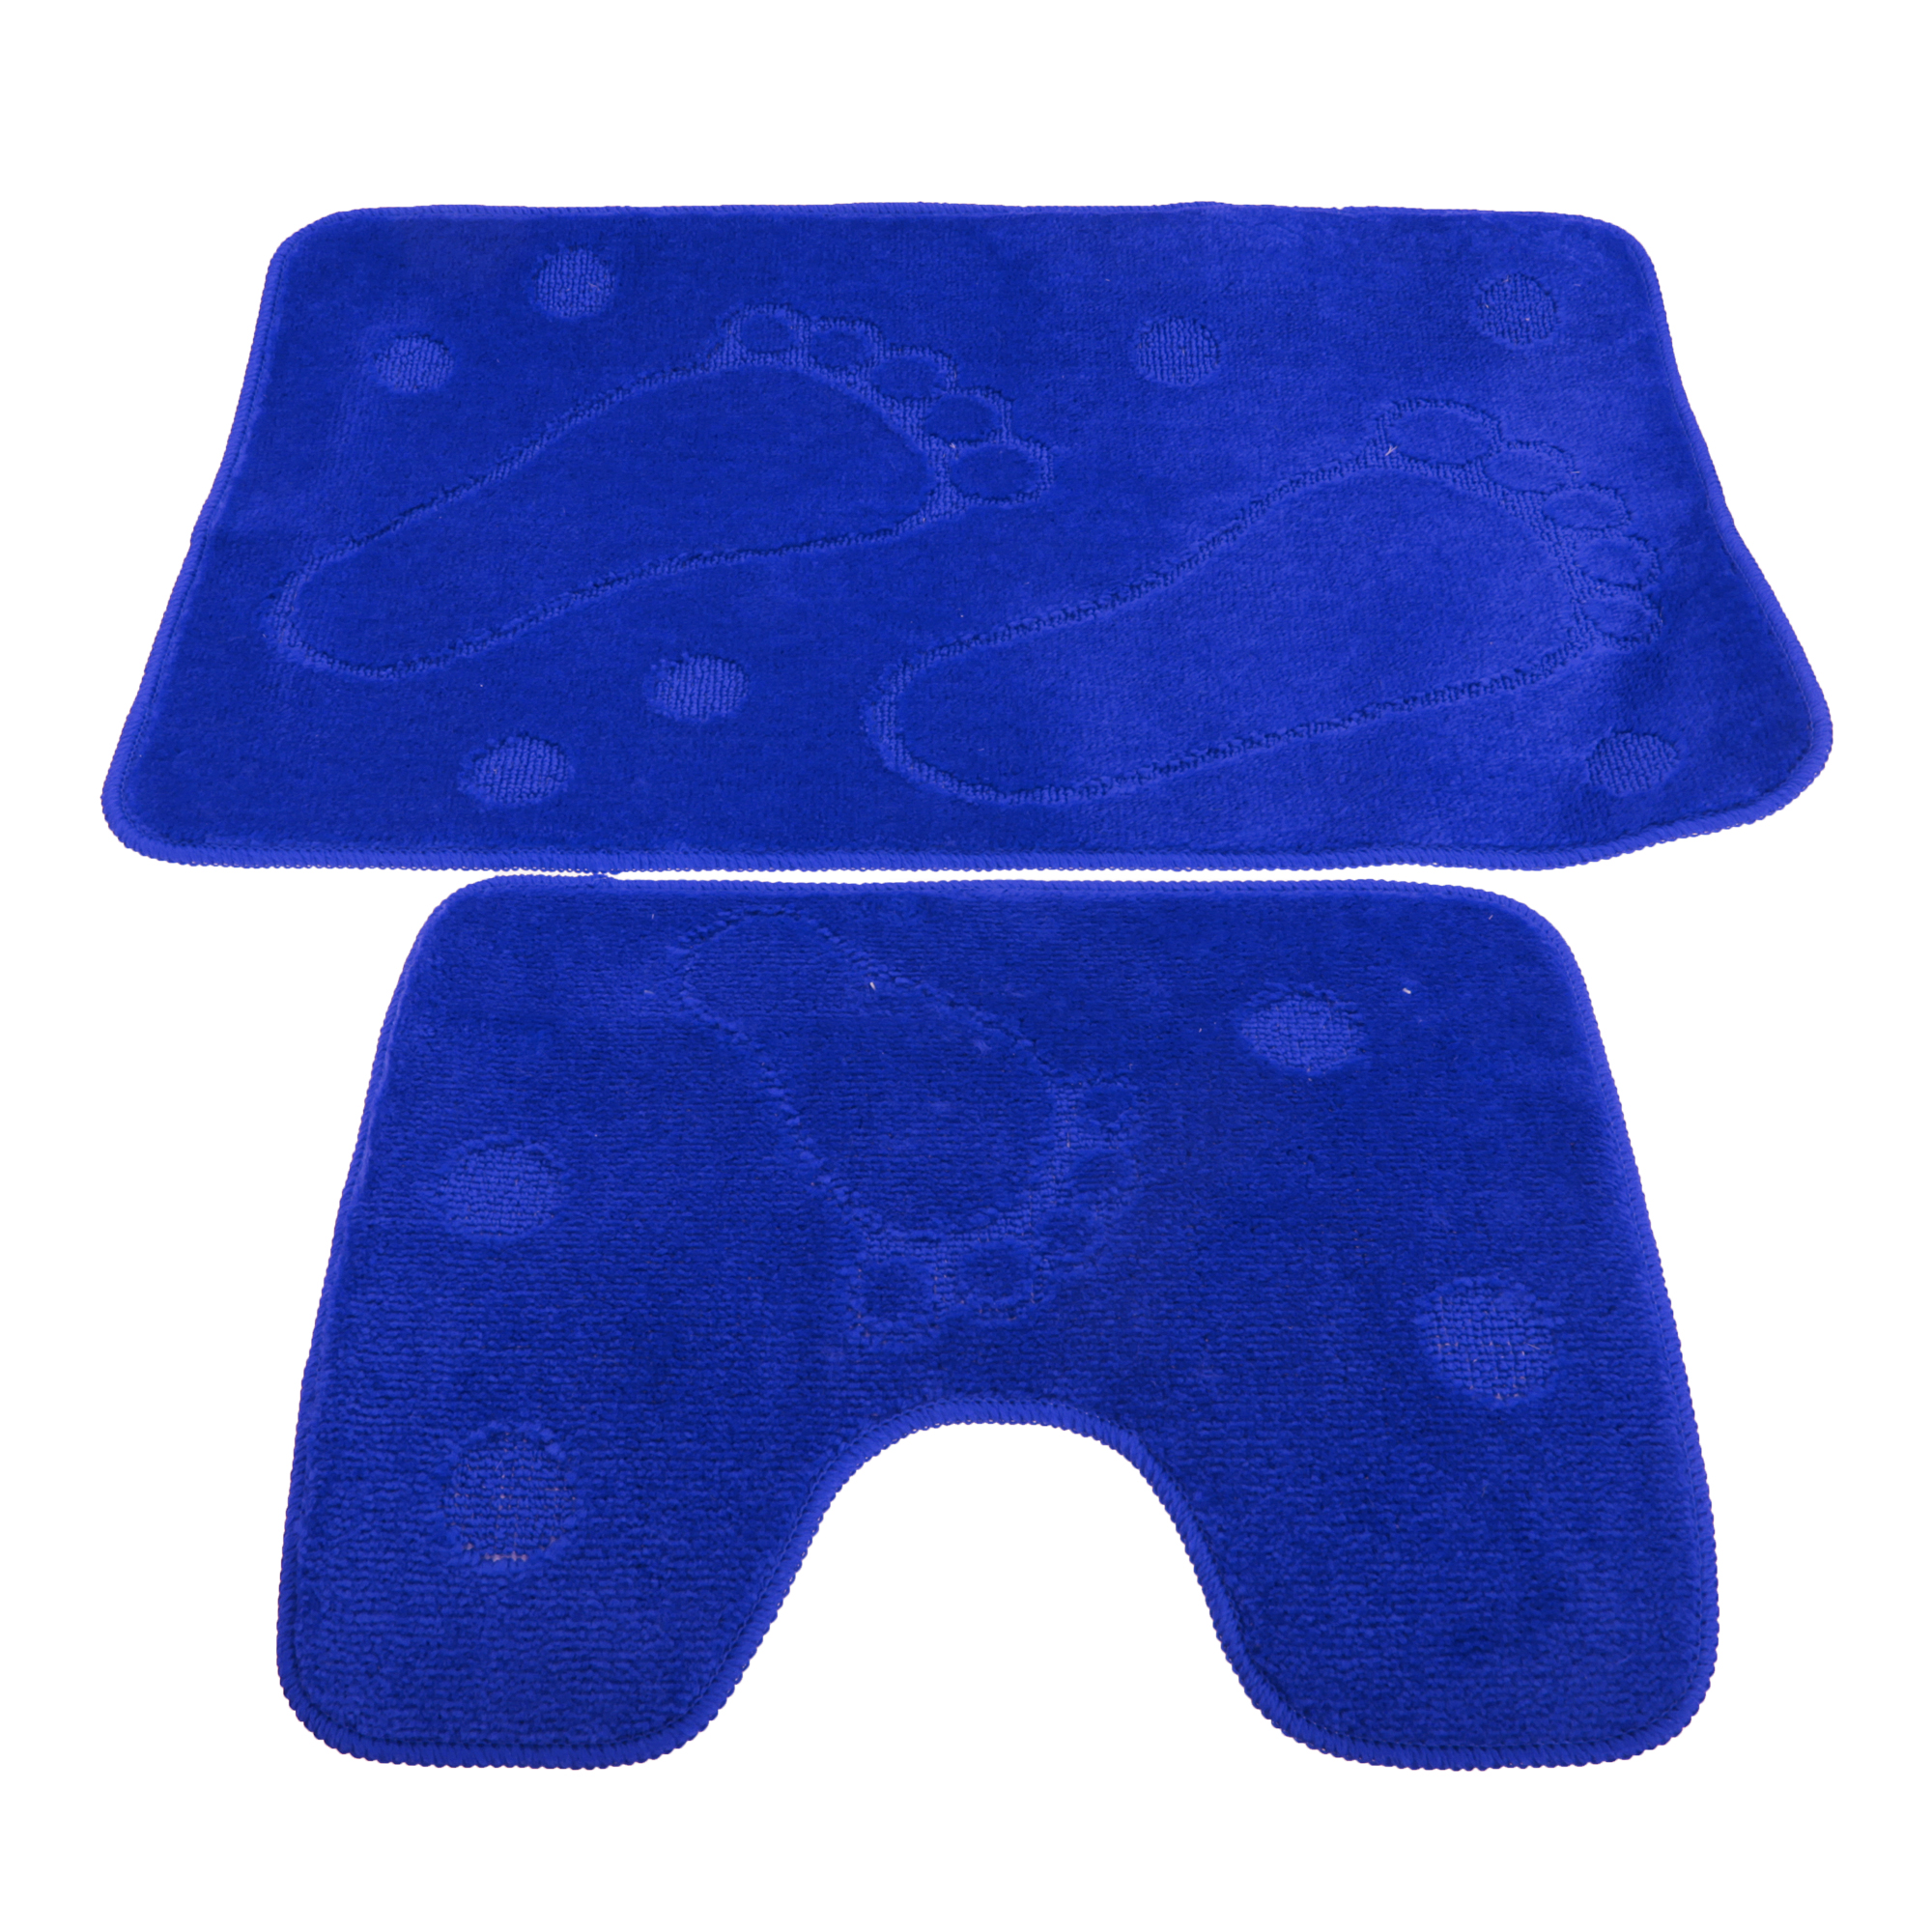 2 Piece Footprint Design Bathroom Bath Mat And Pedestal Rug Set Ebay